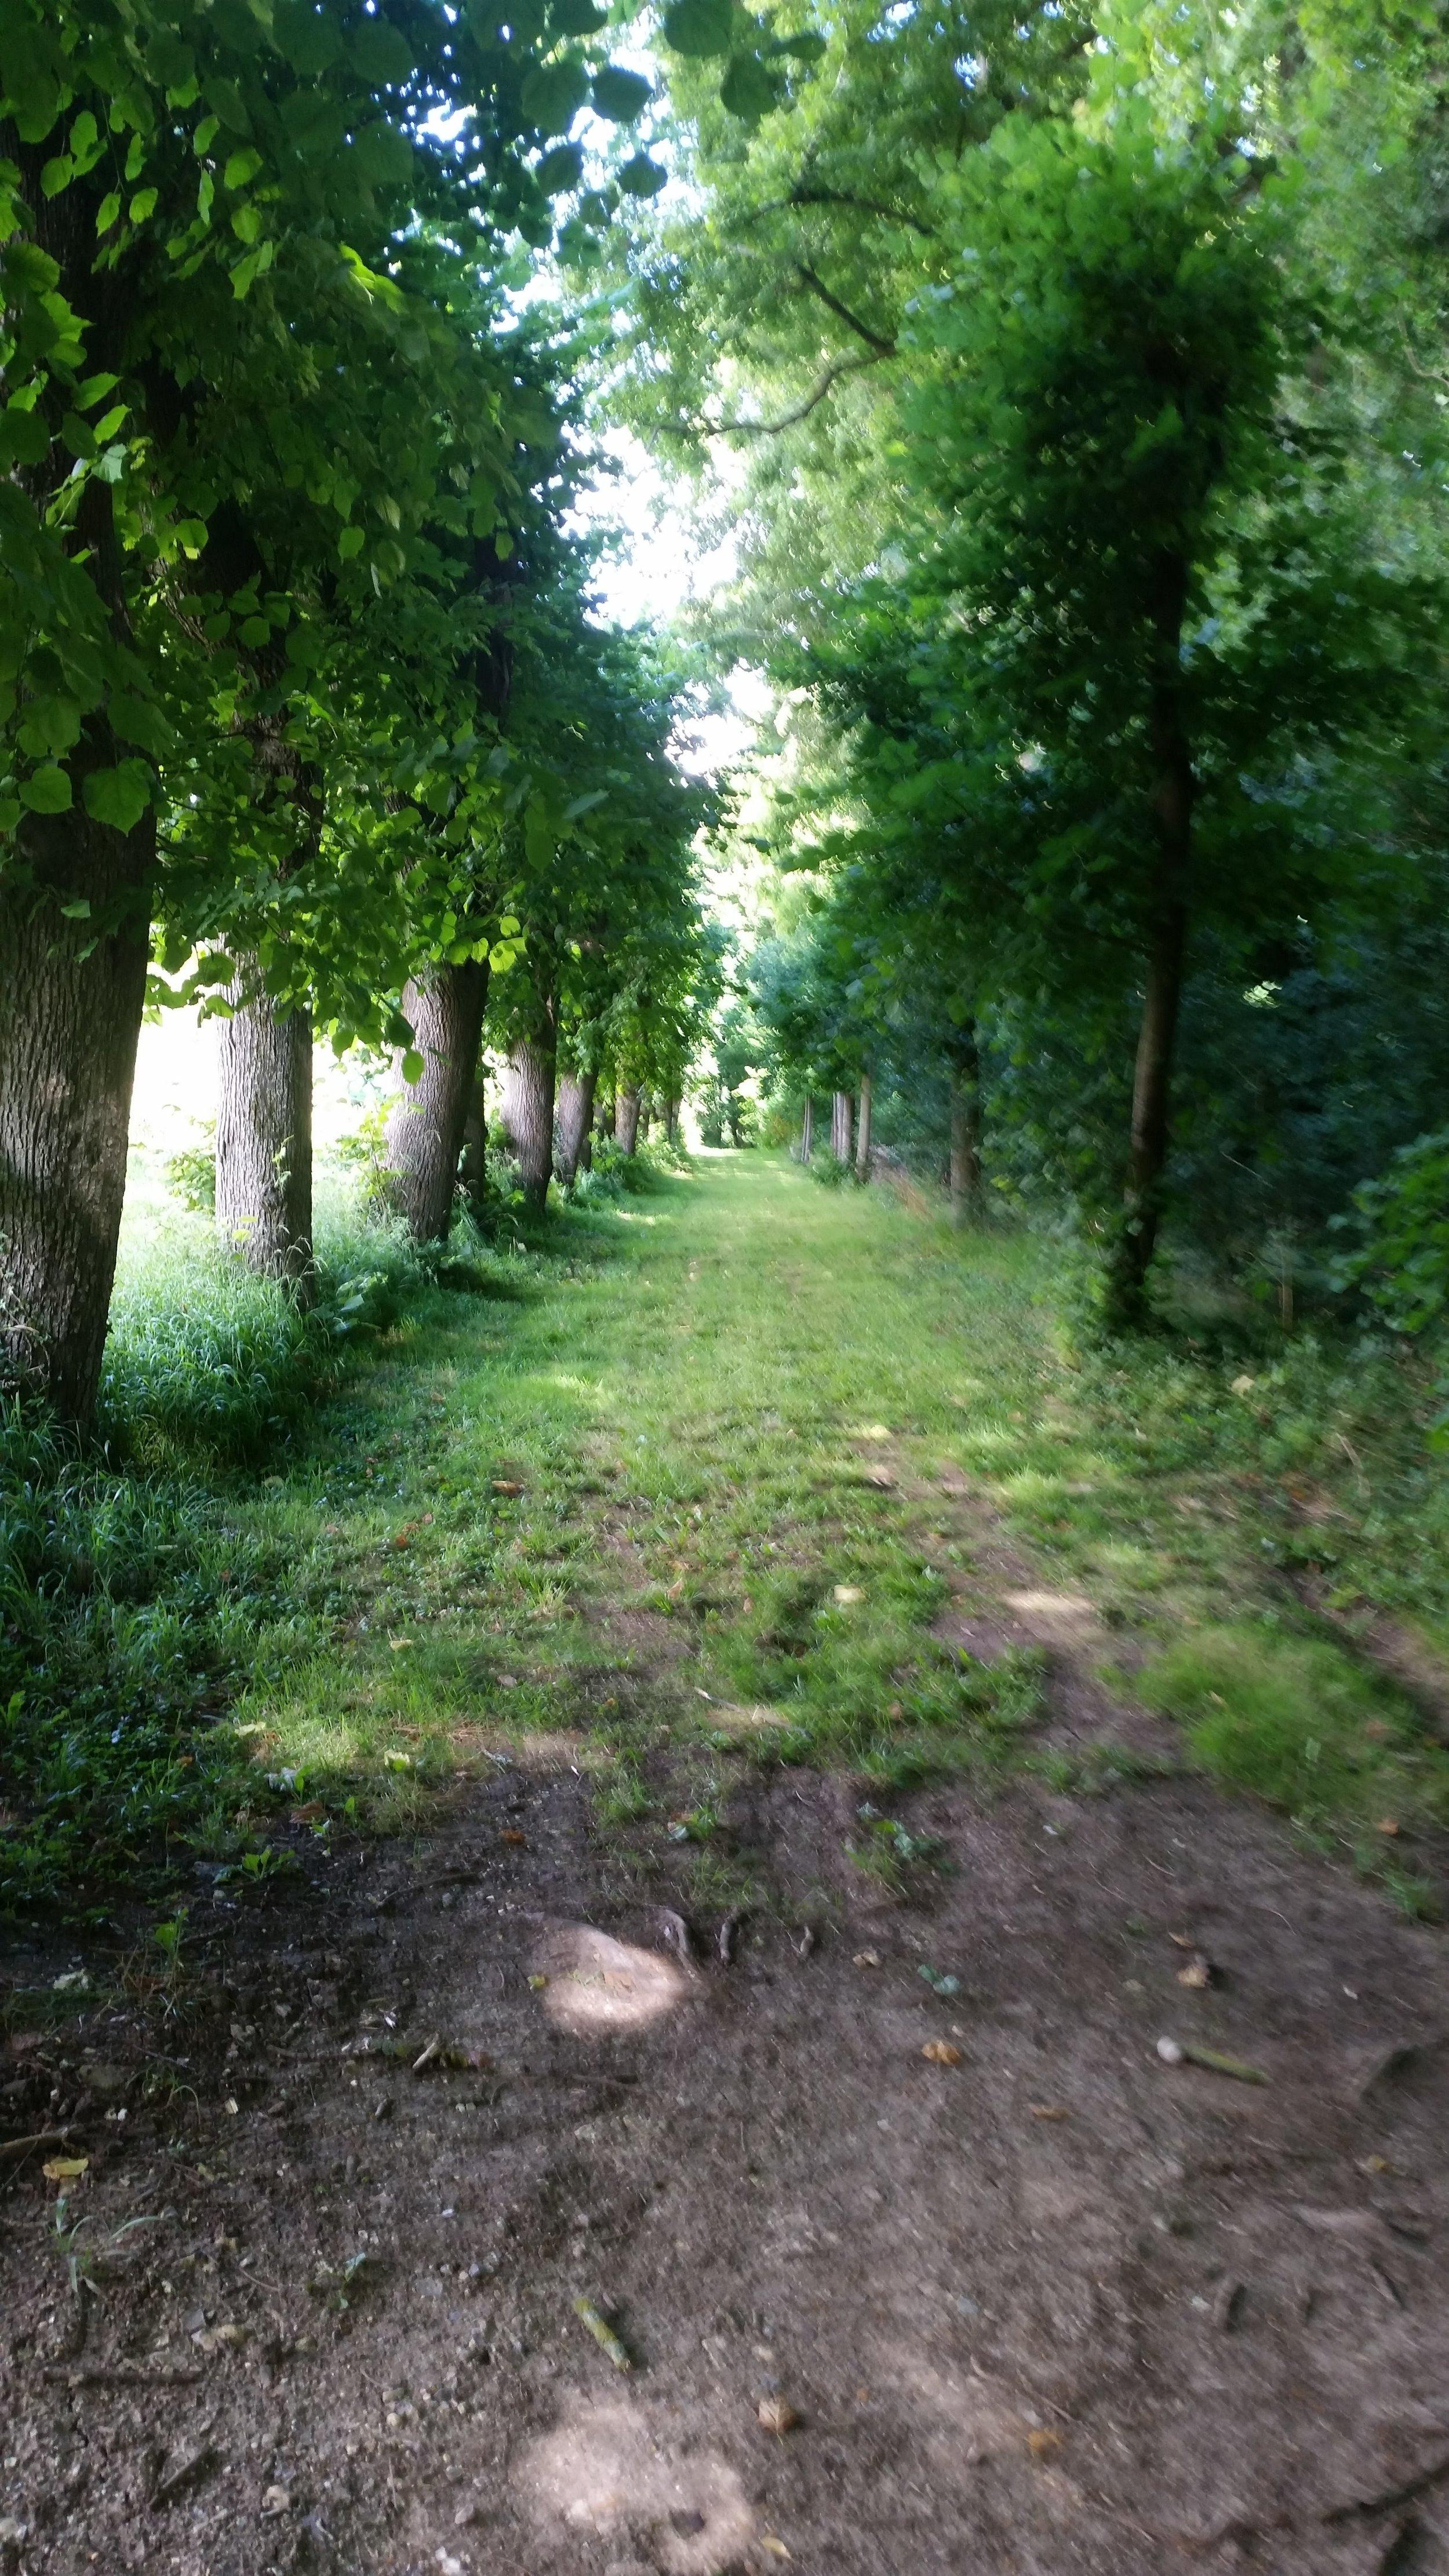 parc walk 20160717_113316.jpg